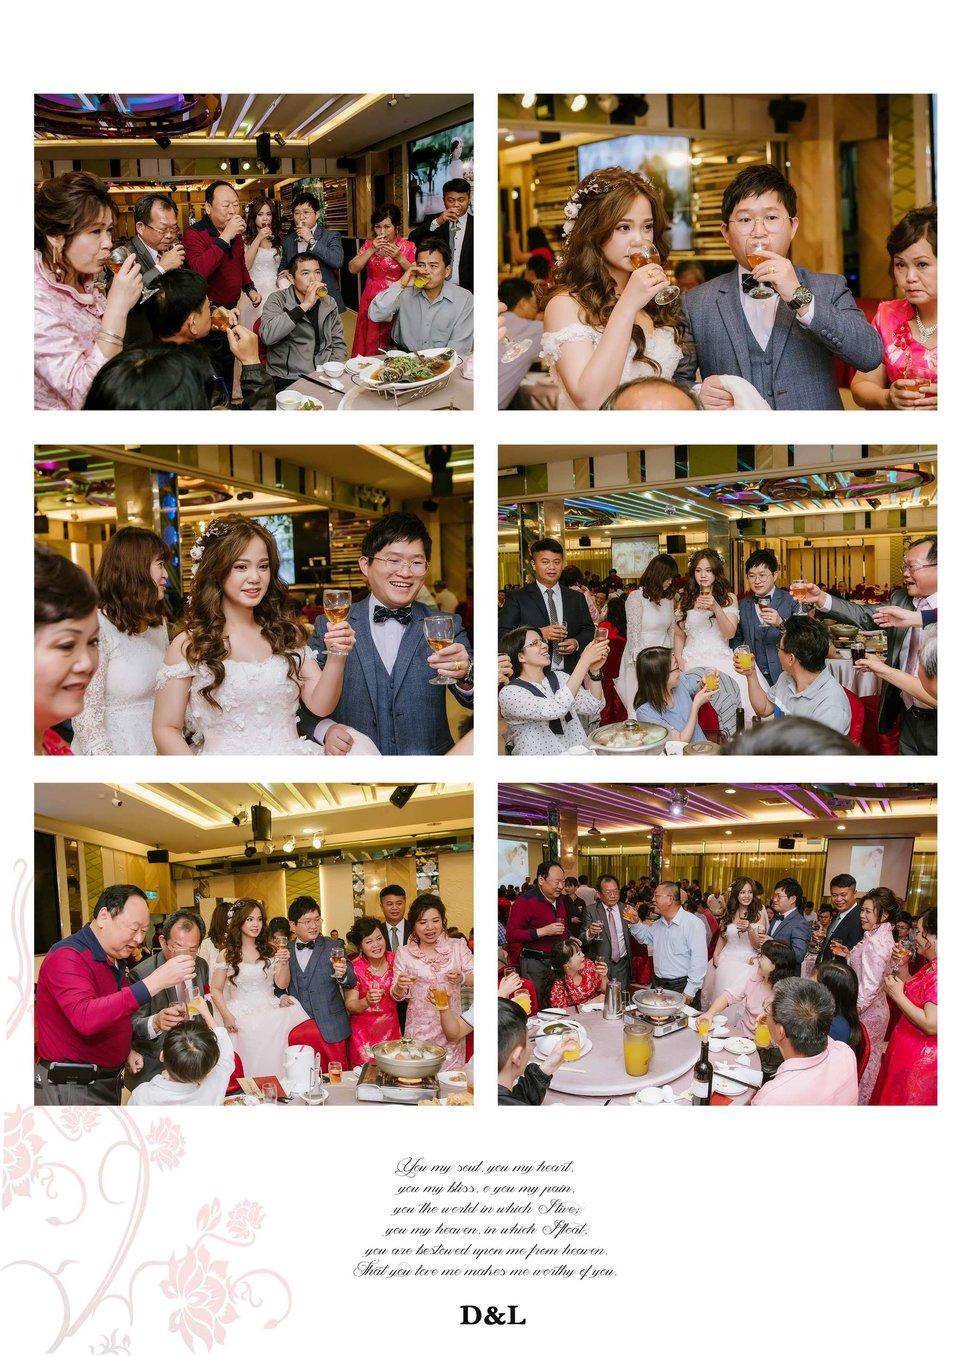 41 - D&L 婚禮事務 · 婚禮婚紗攝影《結婚吧》